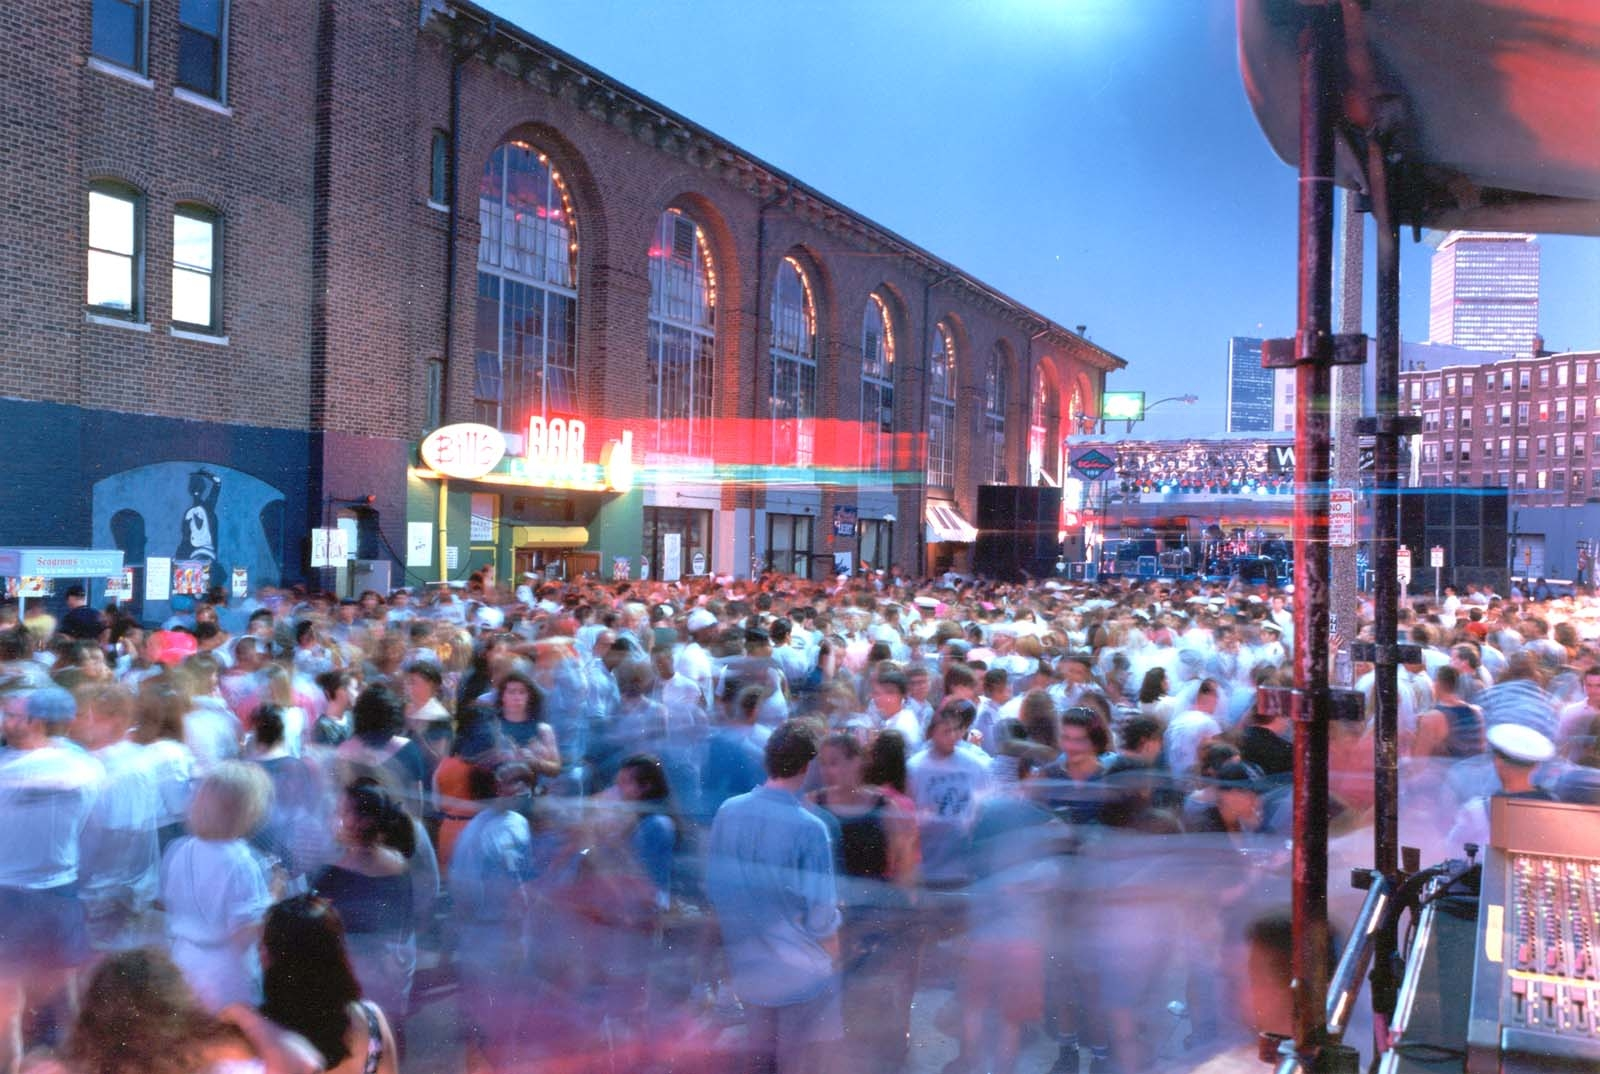 ... transformed this small street into Boston's premier nightclub location